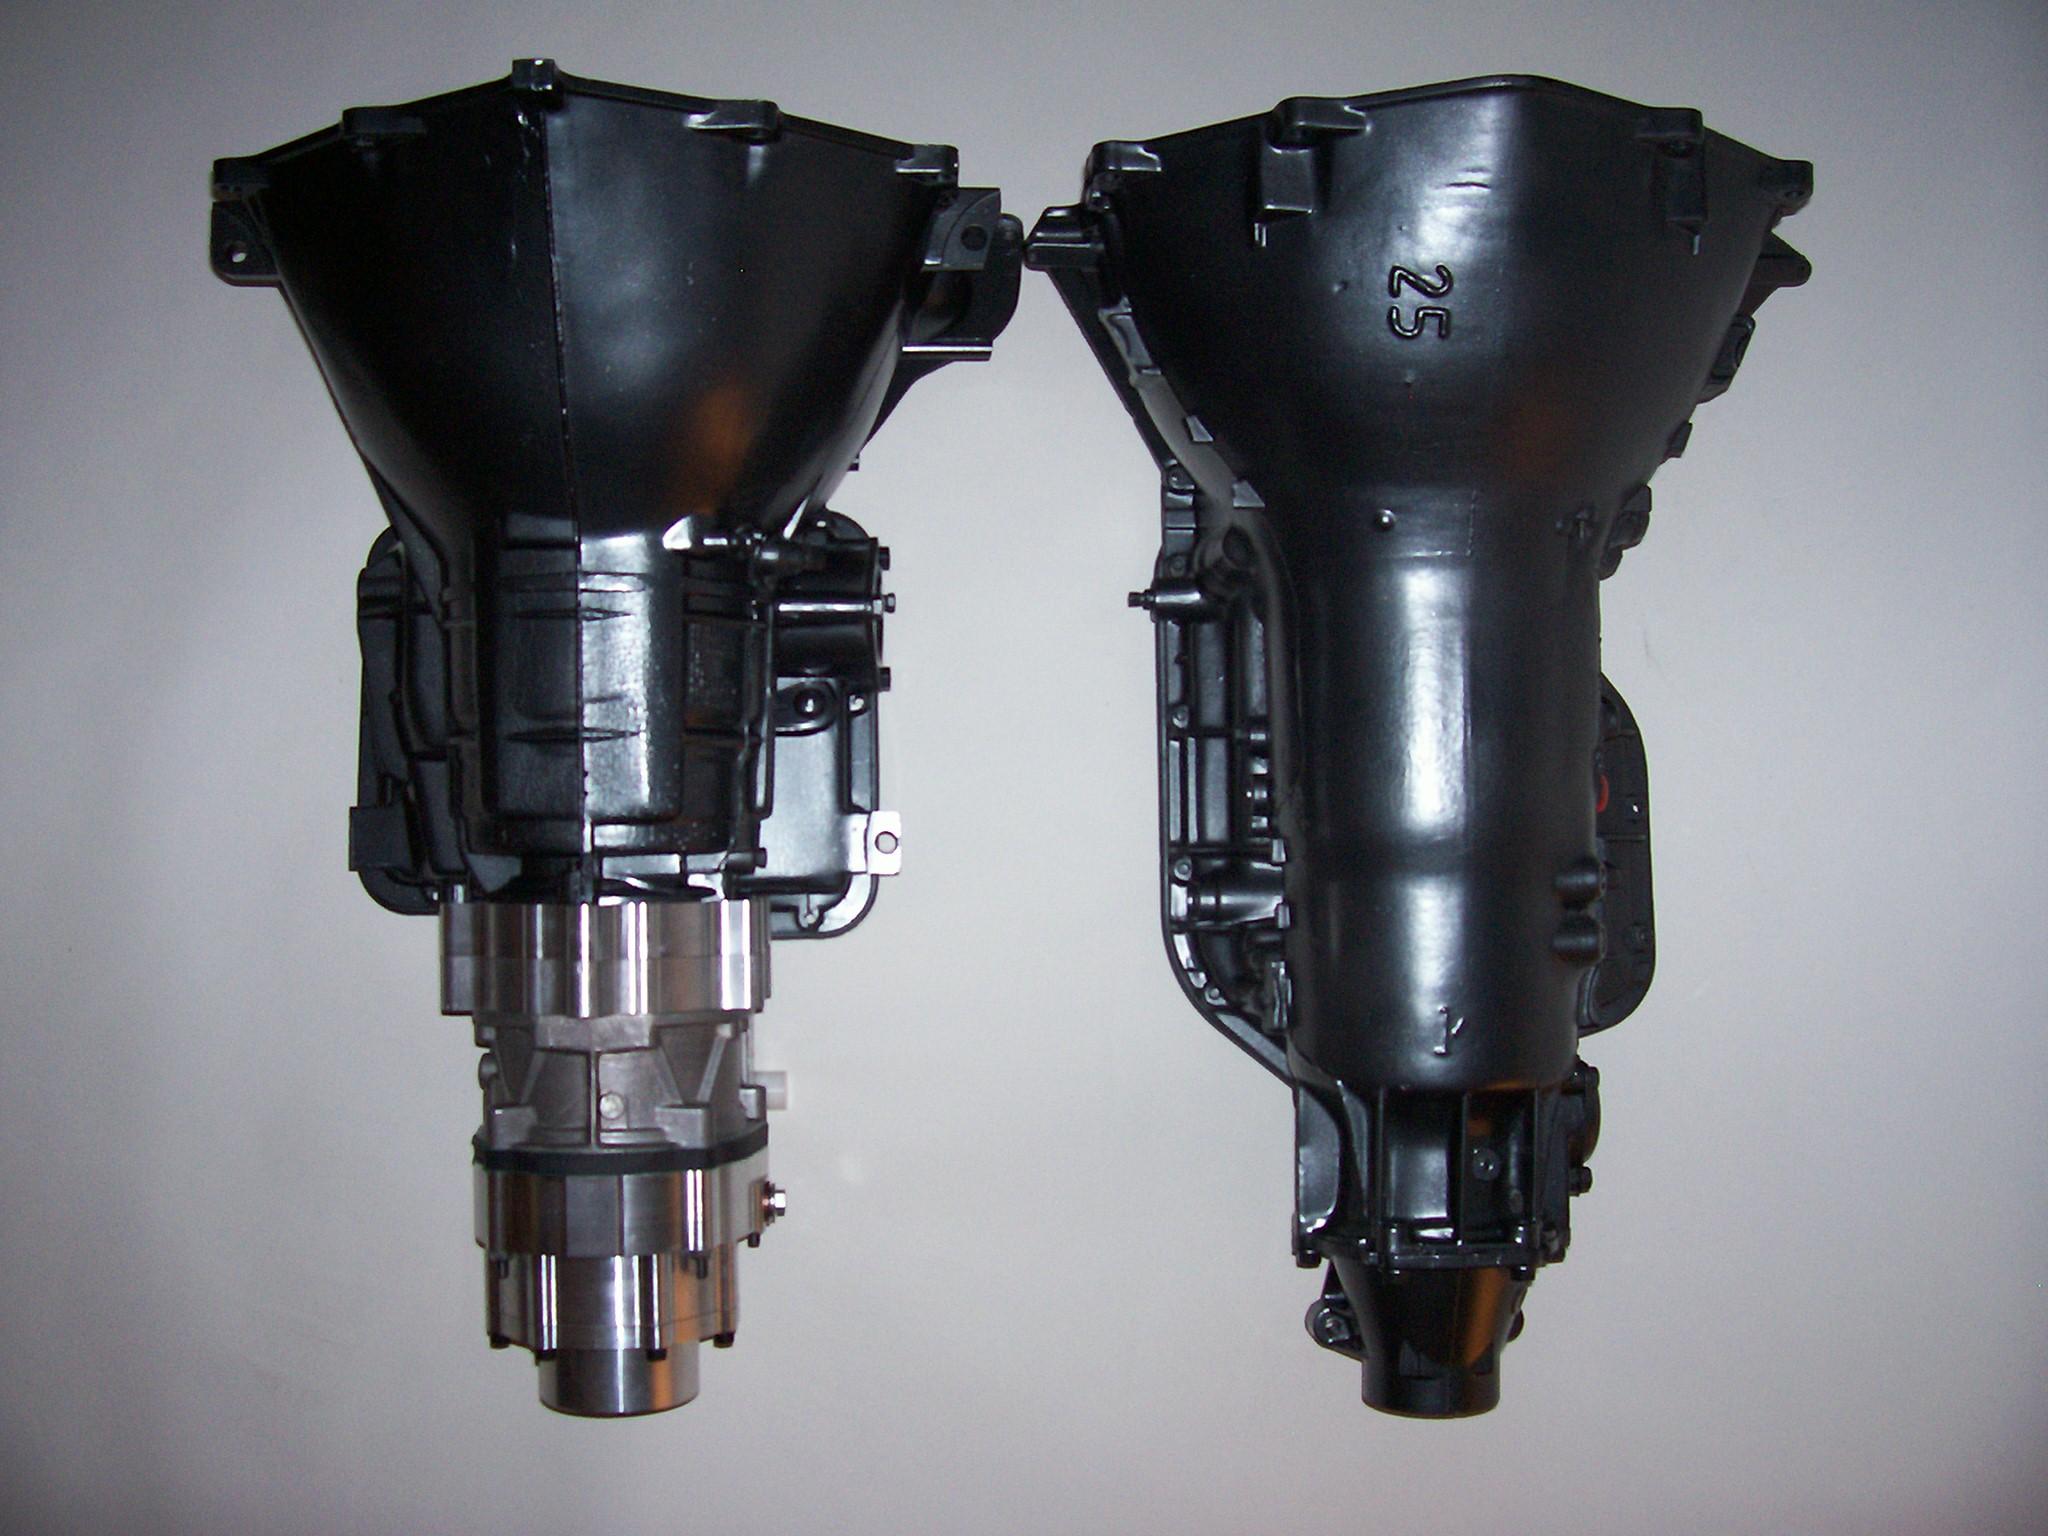 Gm 4l80e Transmission Wiring Overdrive Gearsplitter S Blog